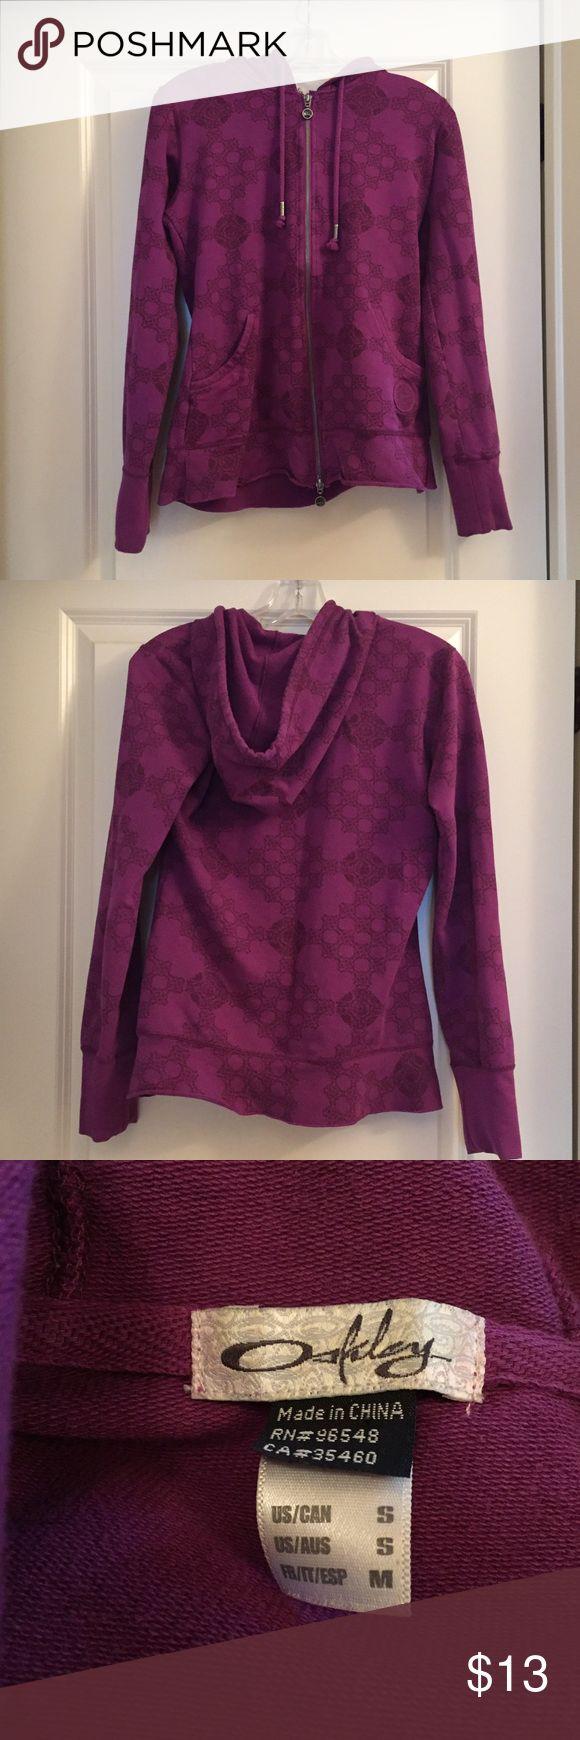 Oakley Hoodie Sweatshirt Zipper Front Small Oakley brand purple zip up hoodie jacket. Size small. Great condition with a simple honeycomb style print. Oakley Tops Sweatshirts & Hoodies